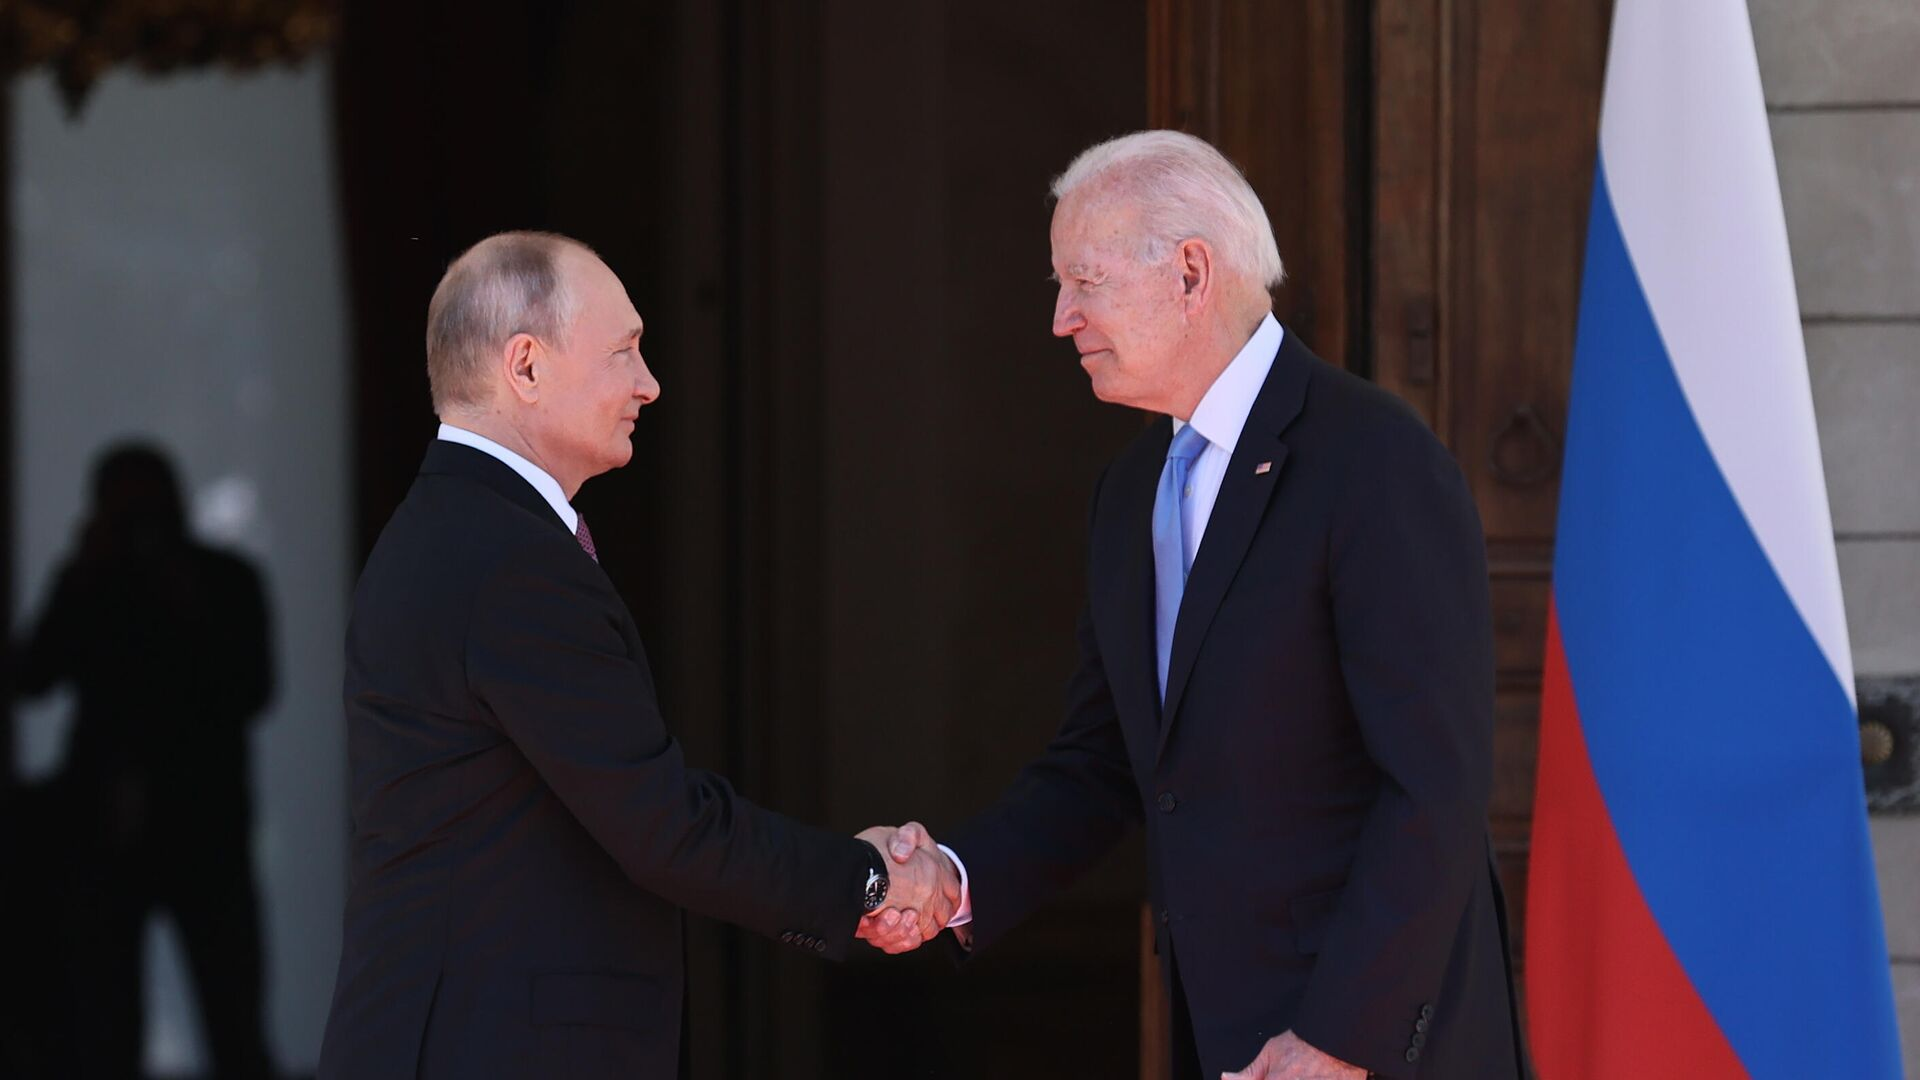 Президент РФ Владимир Путин и президент США Джо Байден во время встречи в Женеве на вилле Ла Гранж - РИА Новости, 1920, 16.06.2021